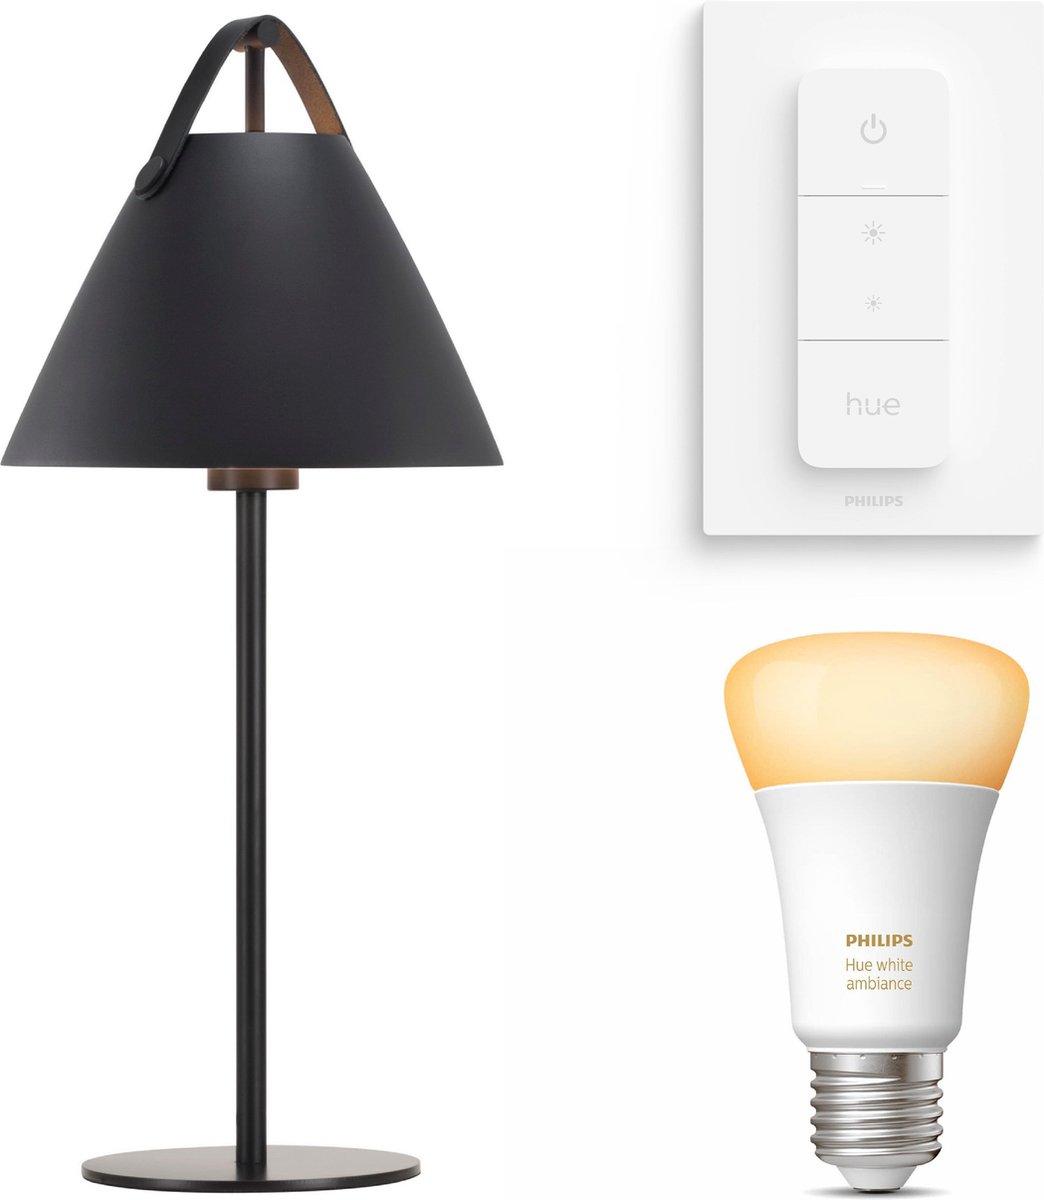 Nordlux Strap tafellamp - zwart - 1 lichtpunt - Incl. Philips Hue White Ambiance E27 & dimmer